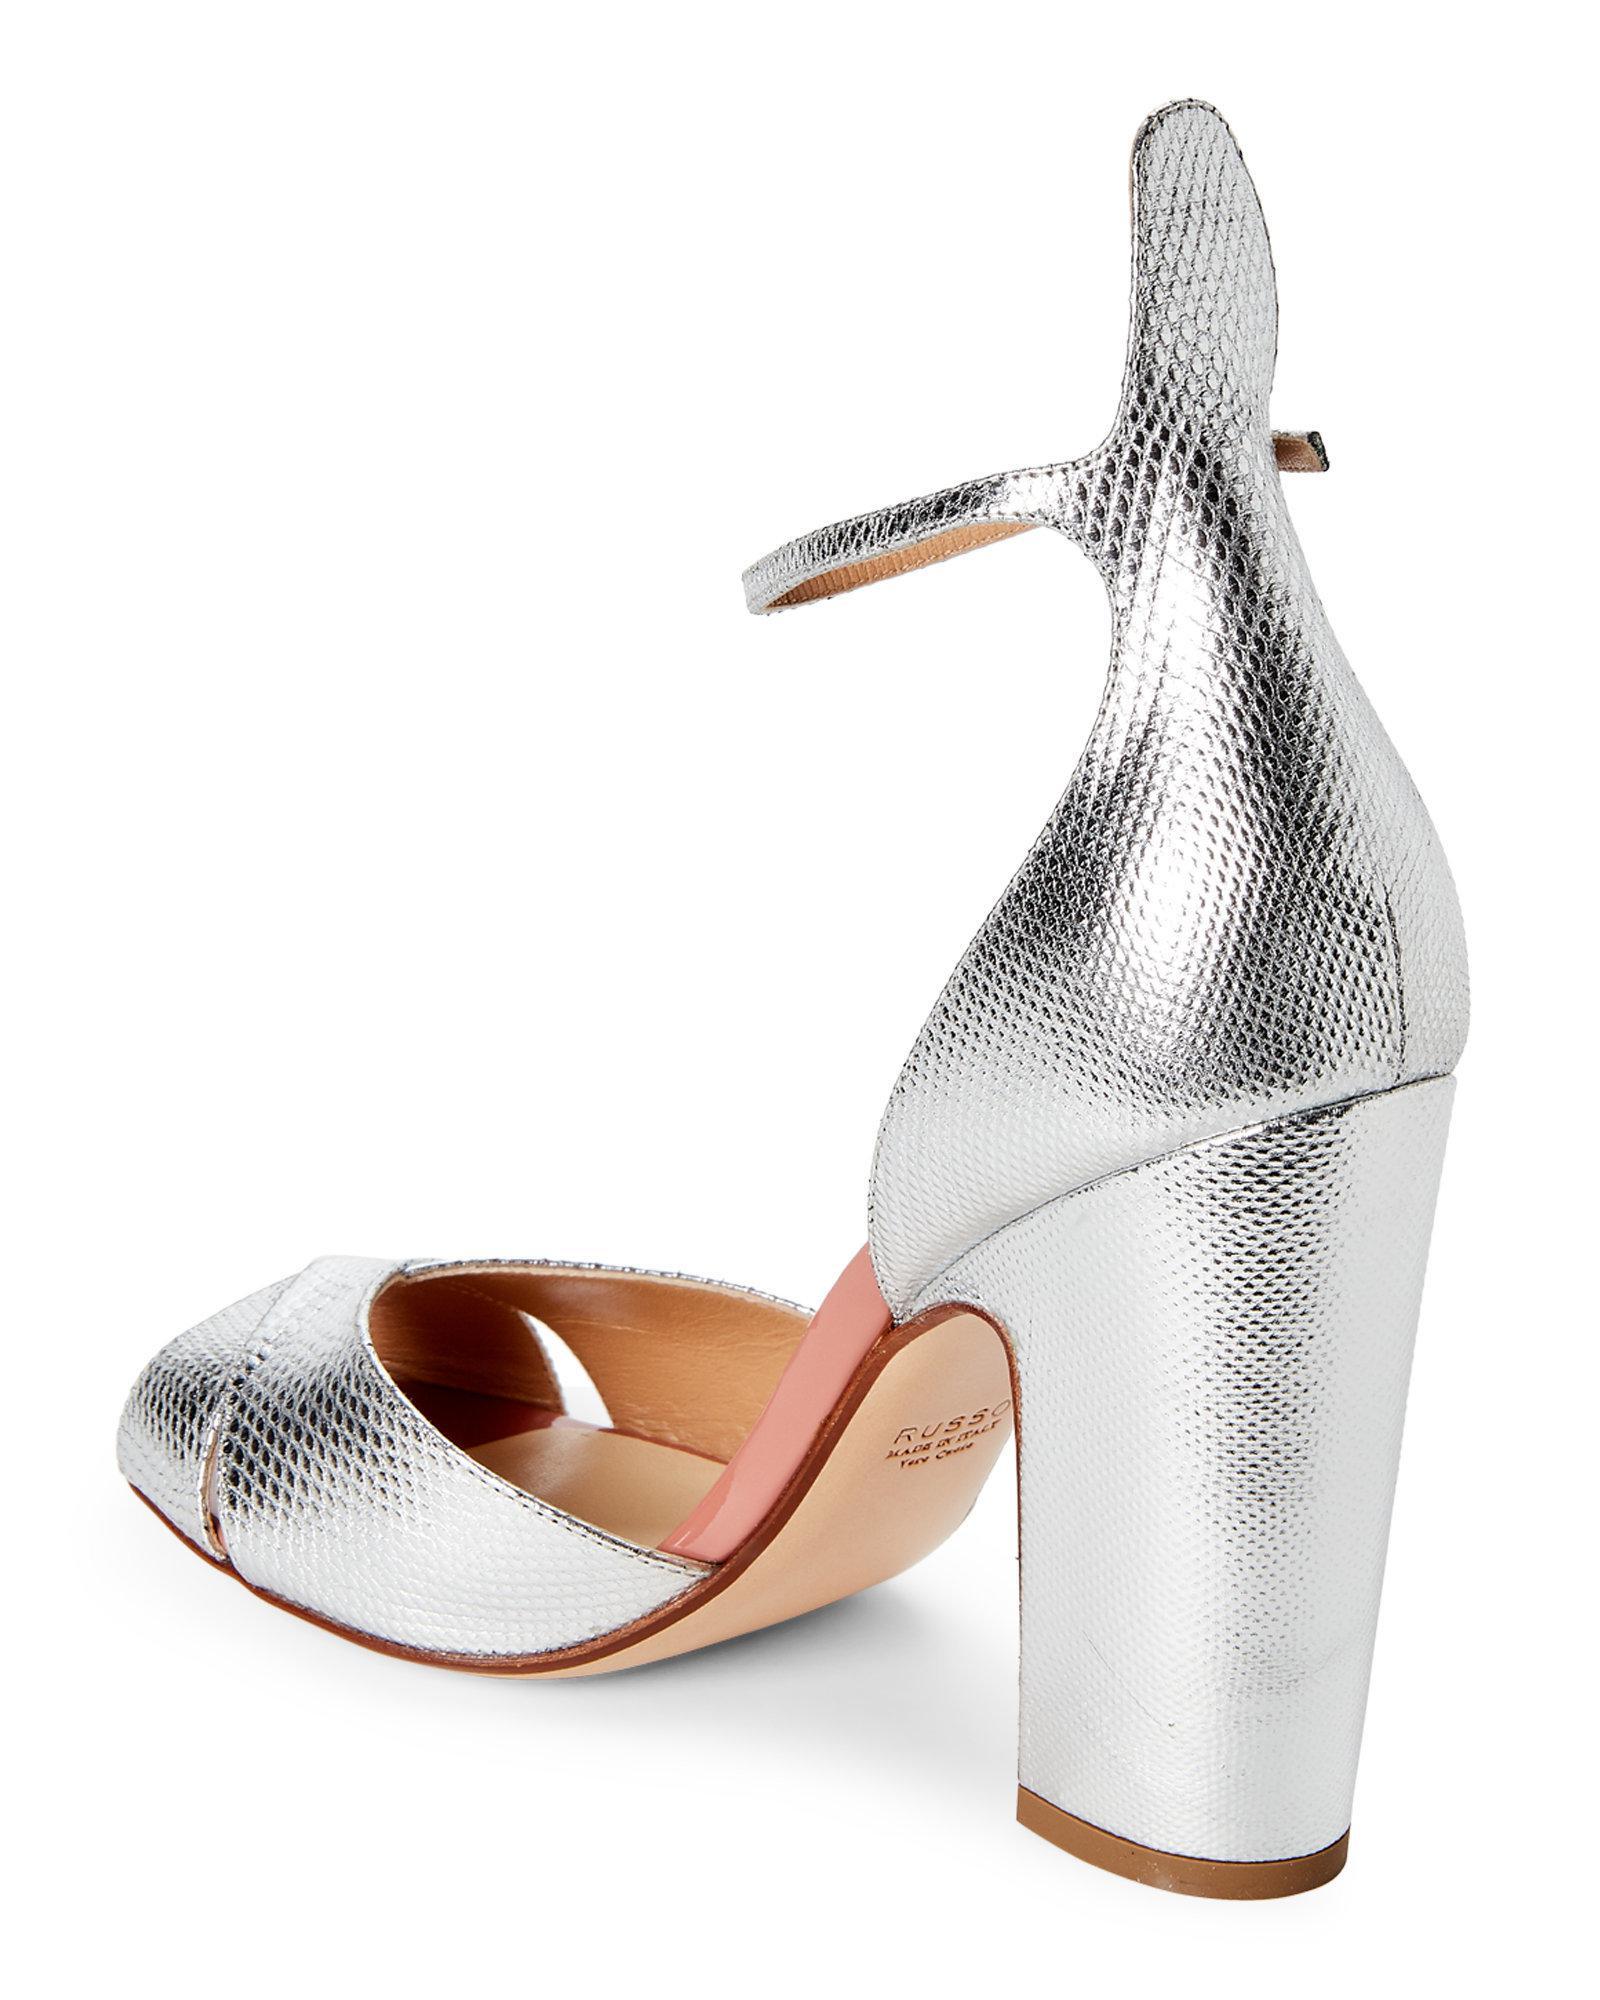 38d8099b652 Lyst - Francesco Russo Silver Leather Peep Toe Pumps in Metallic